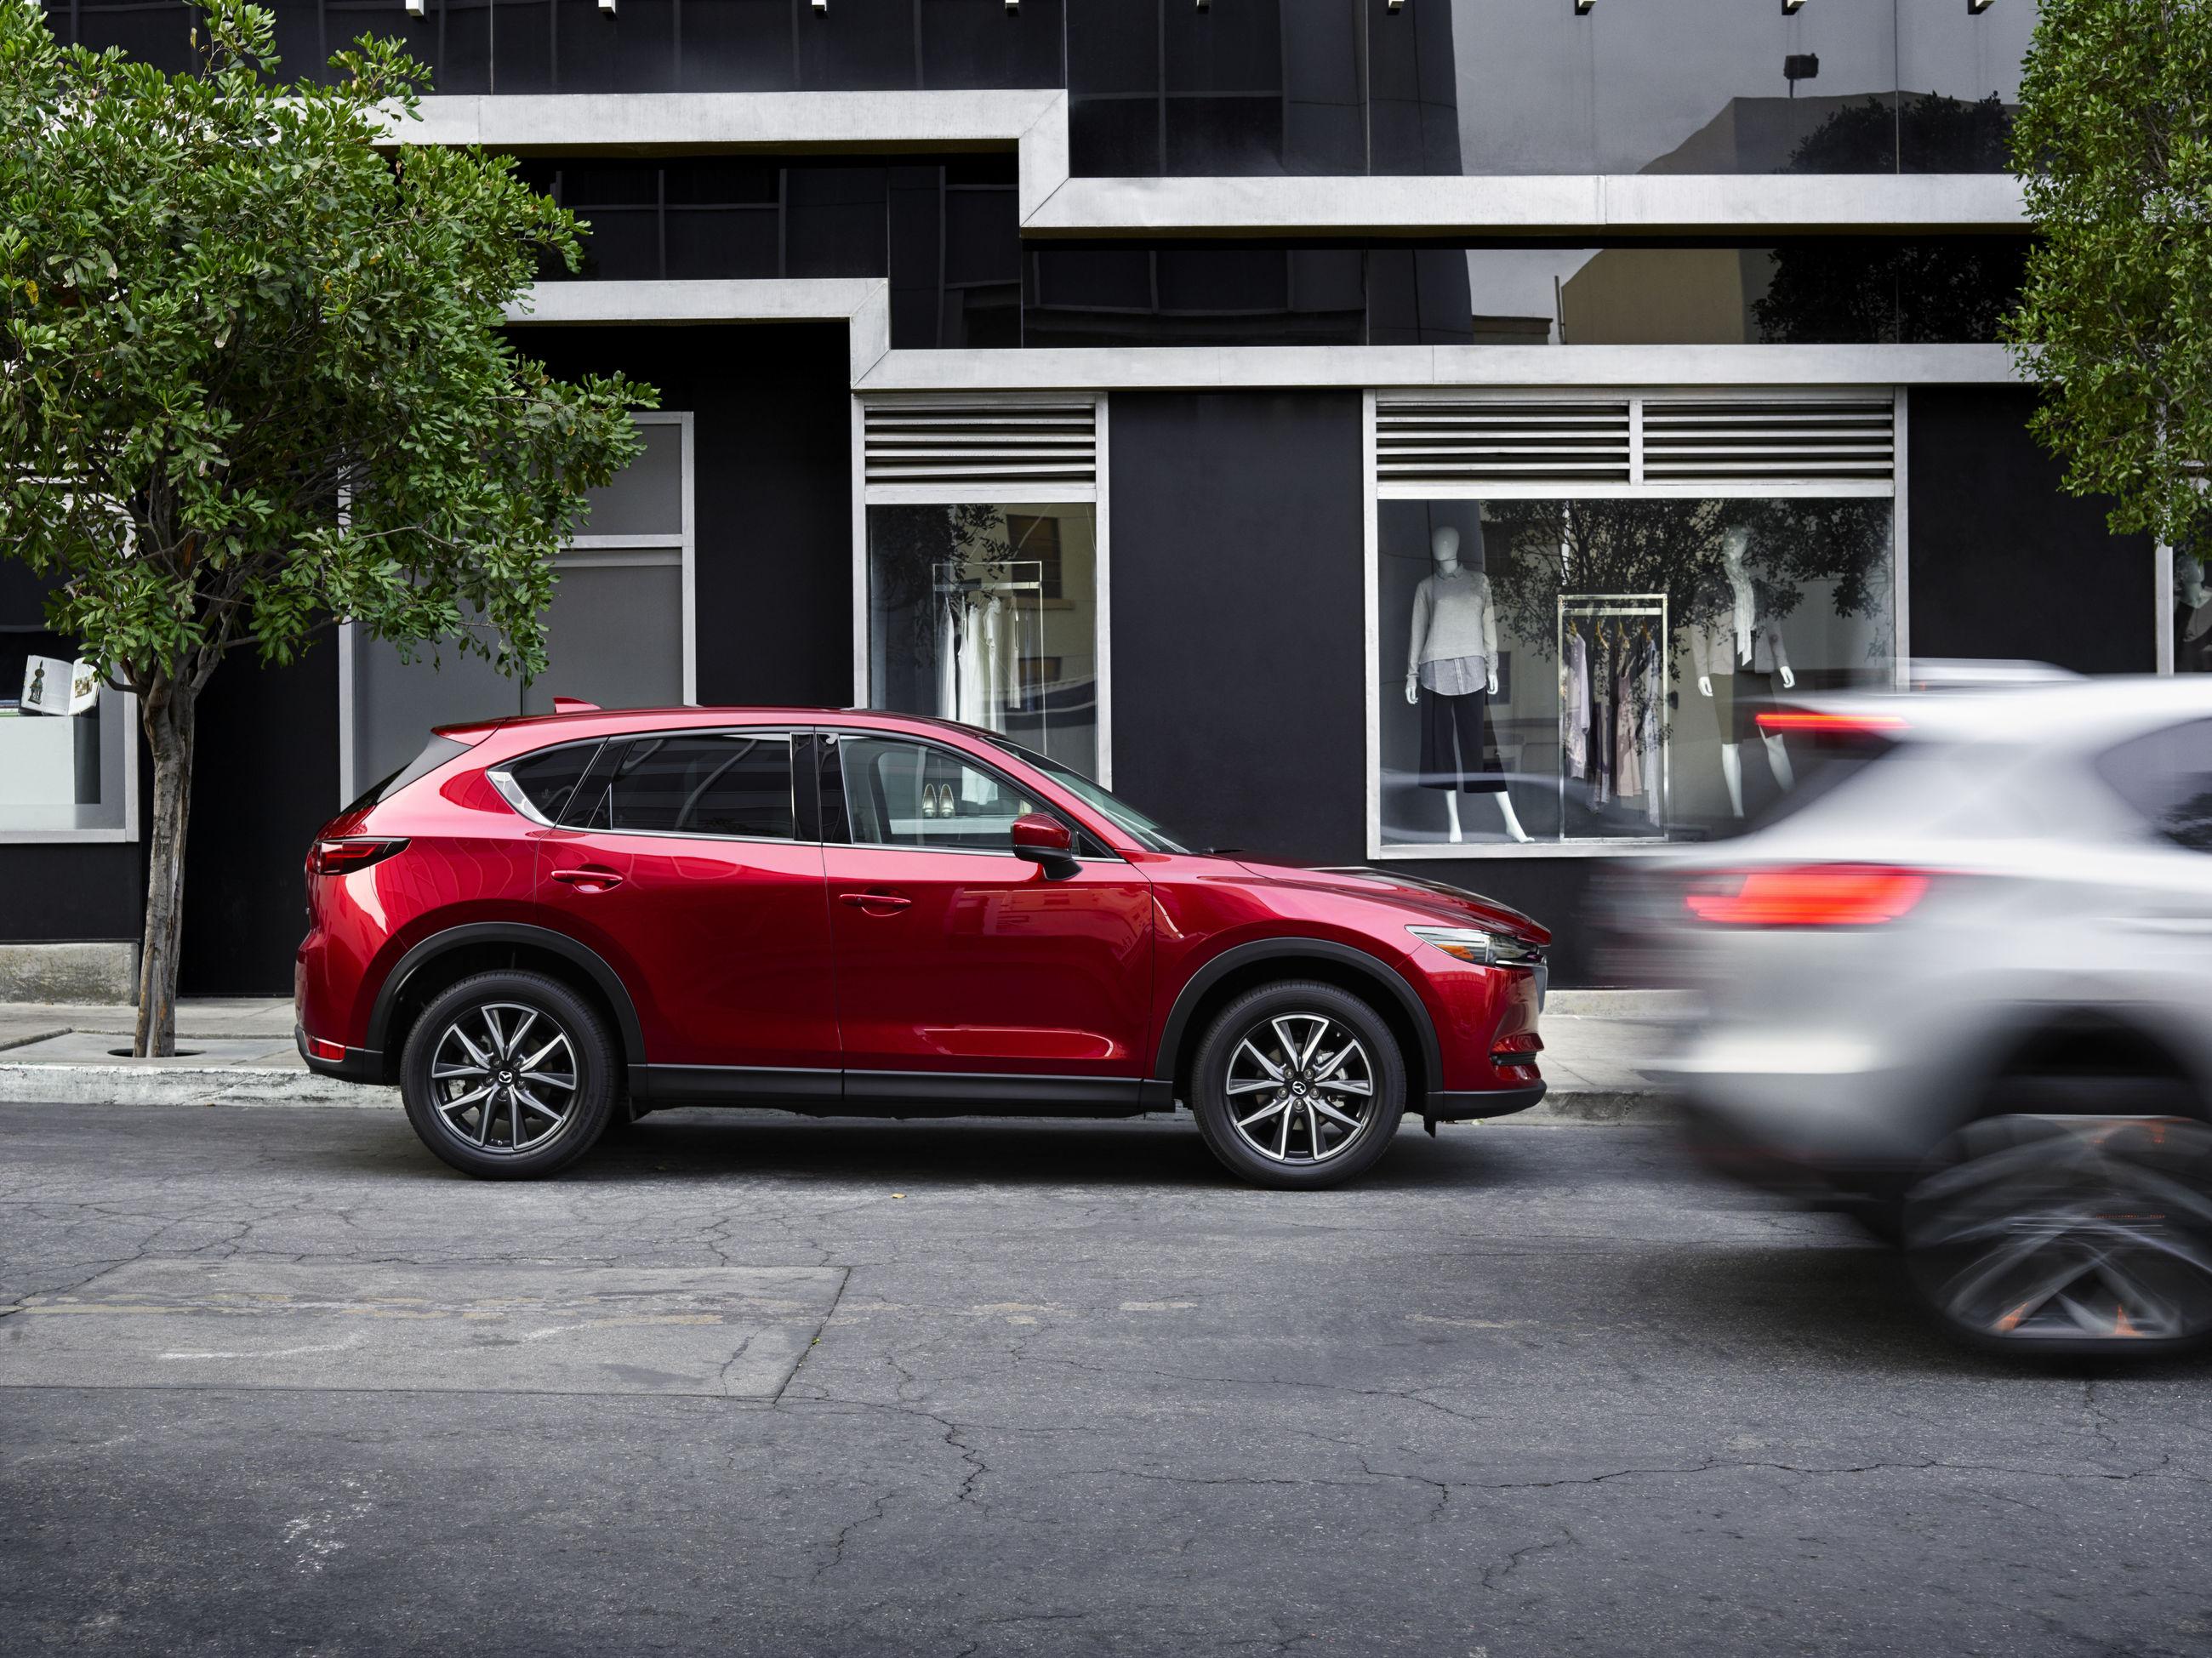 Mazda Introduces New 2017 Mazda CX-5